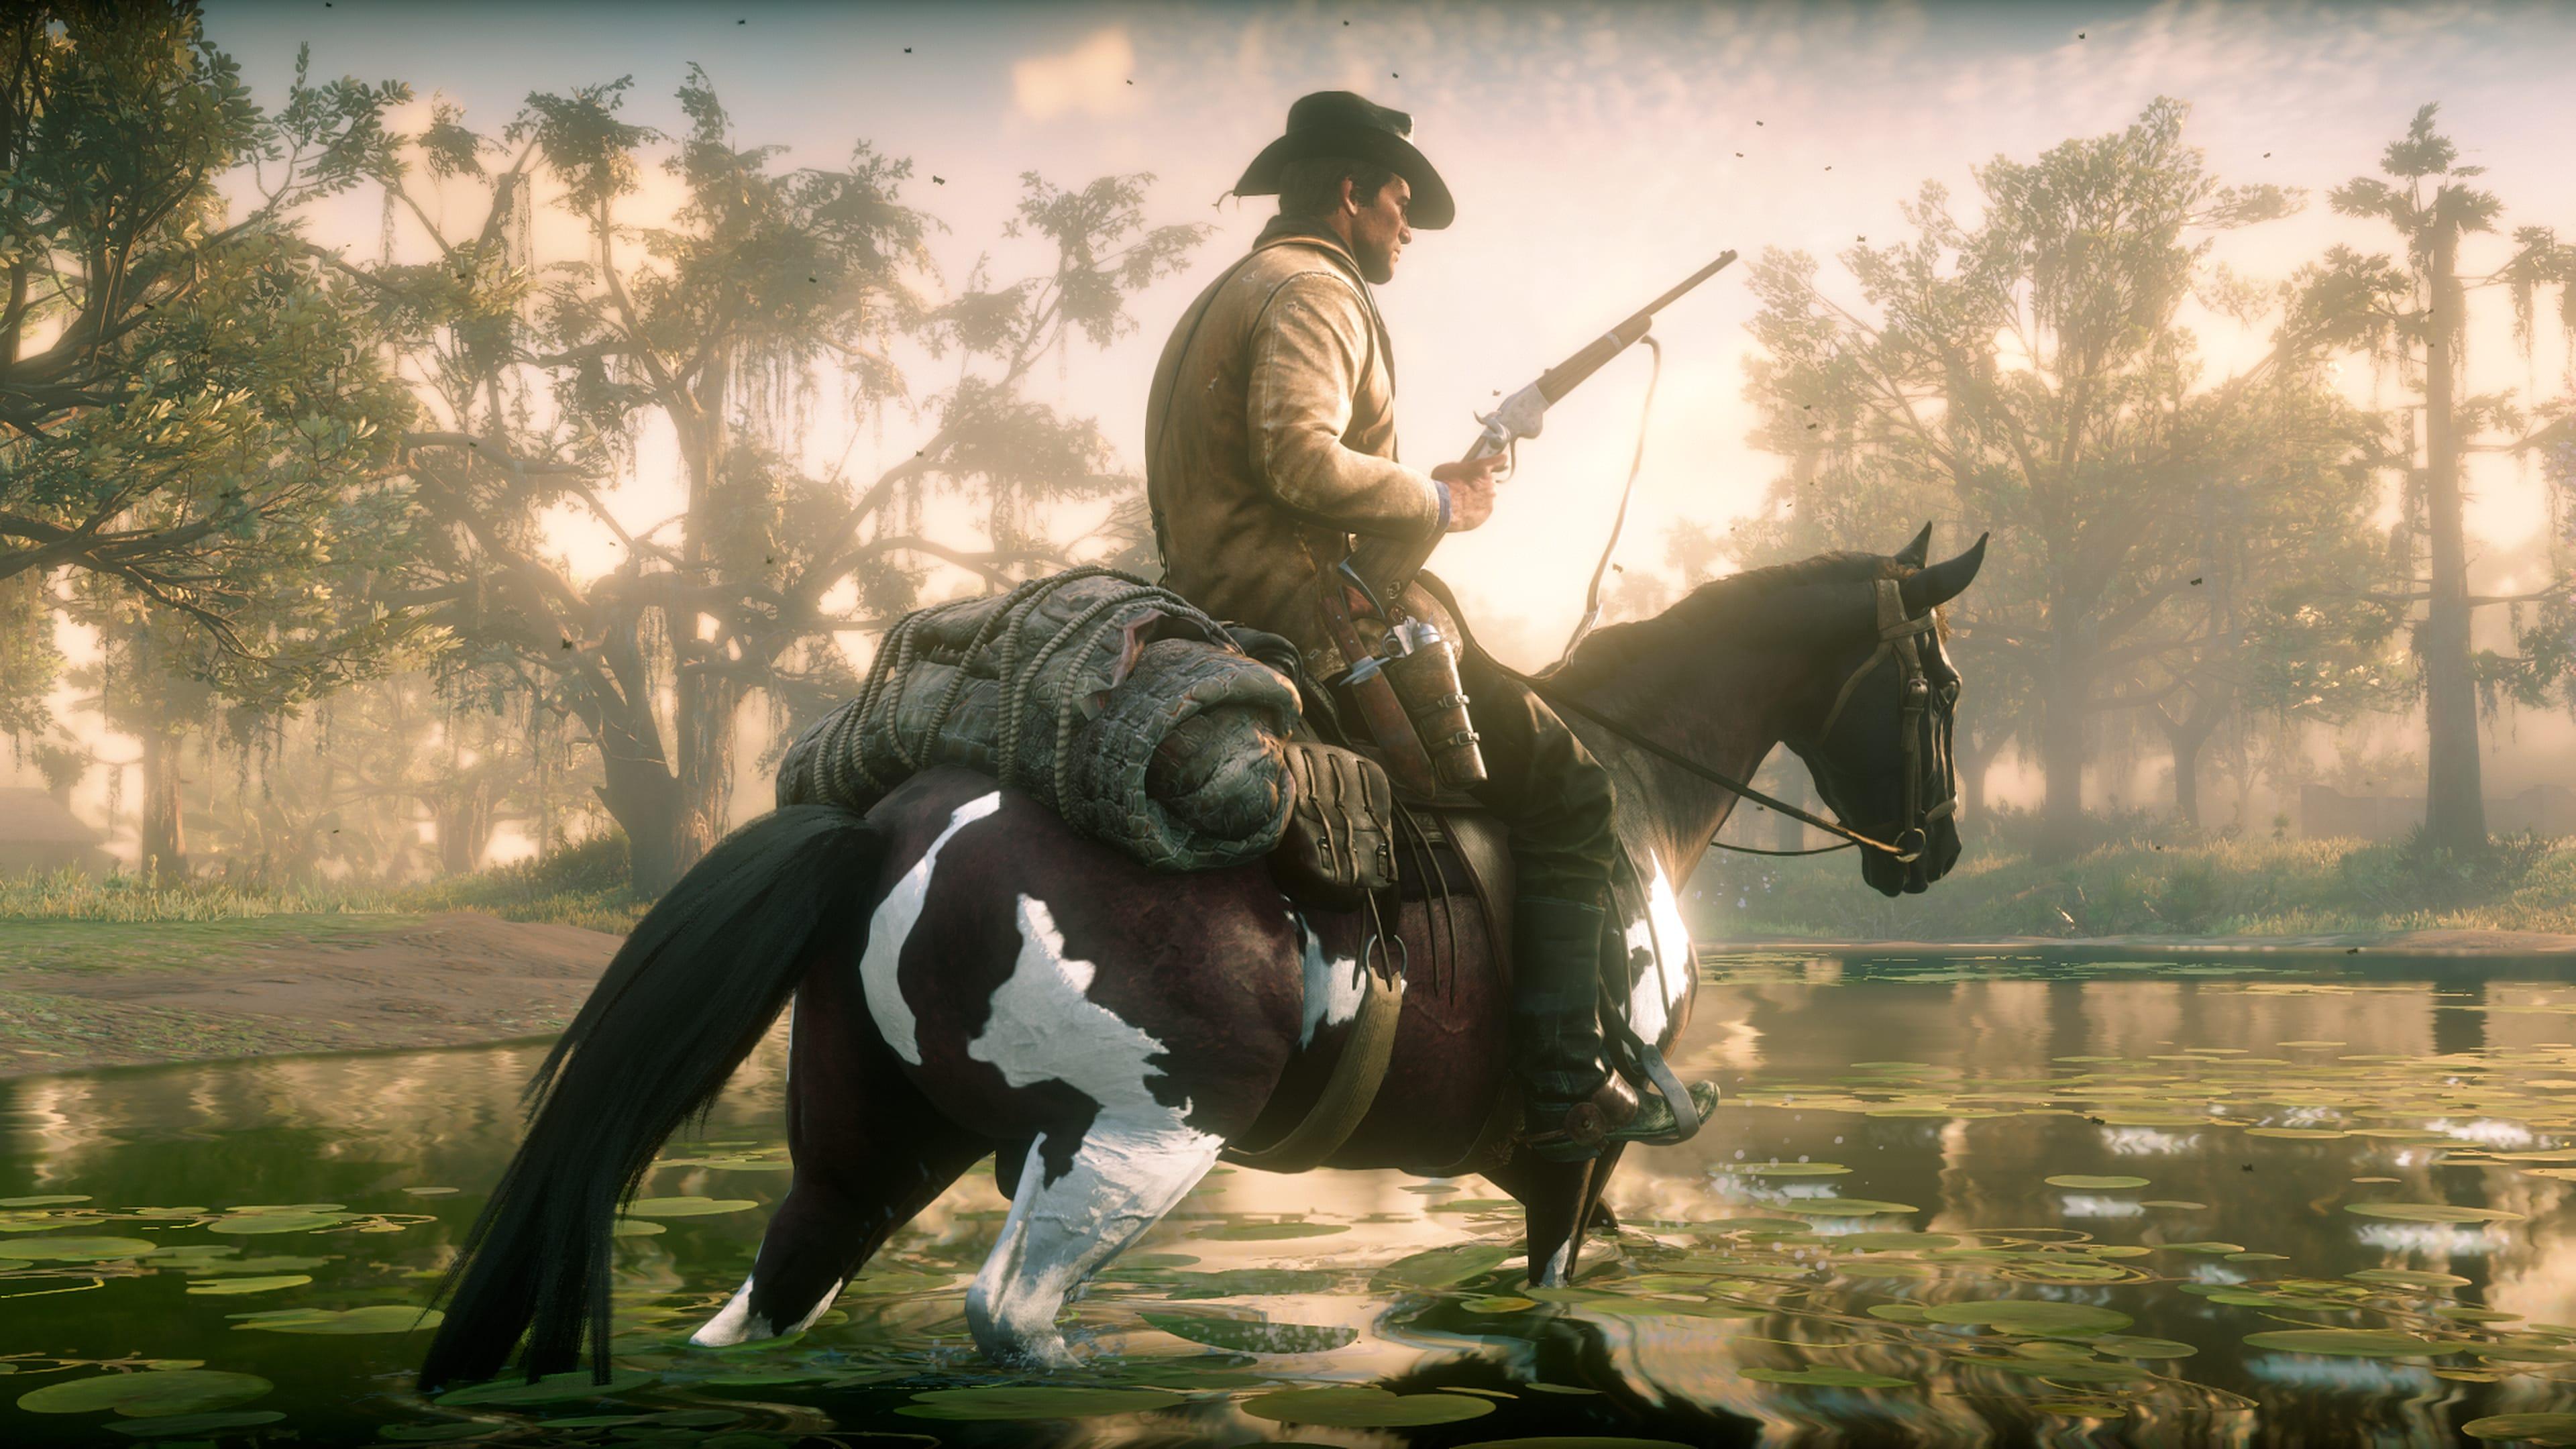 Red Dead Redemption 2 4k Ultra HD Wallpaper | Background ...